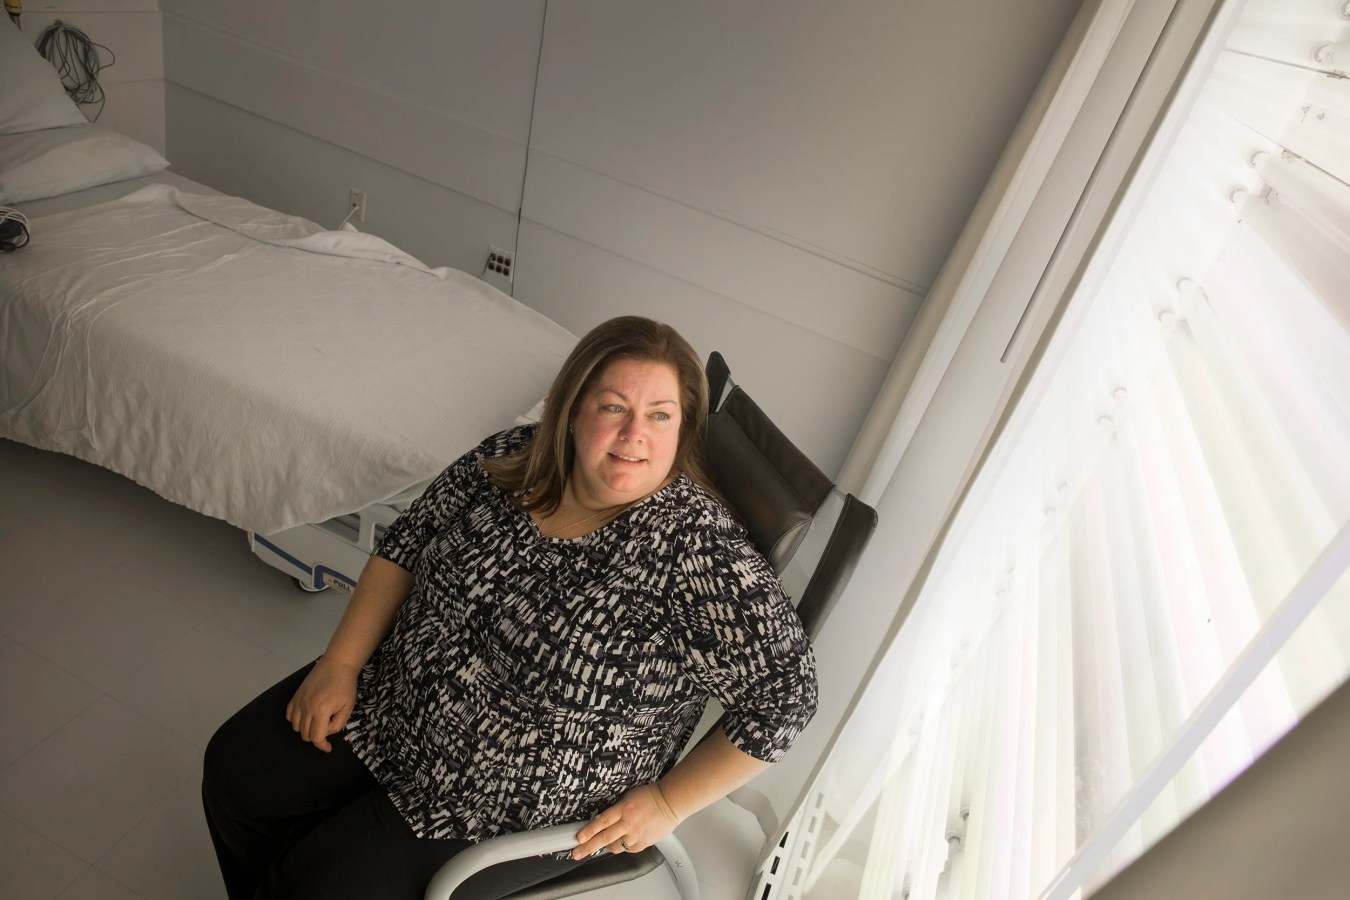 Harvard researcher sheds light on links between sleep and health